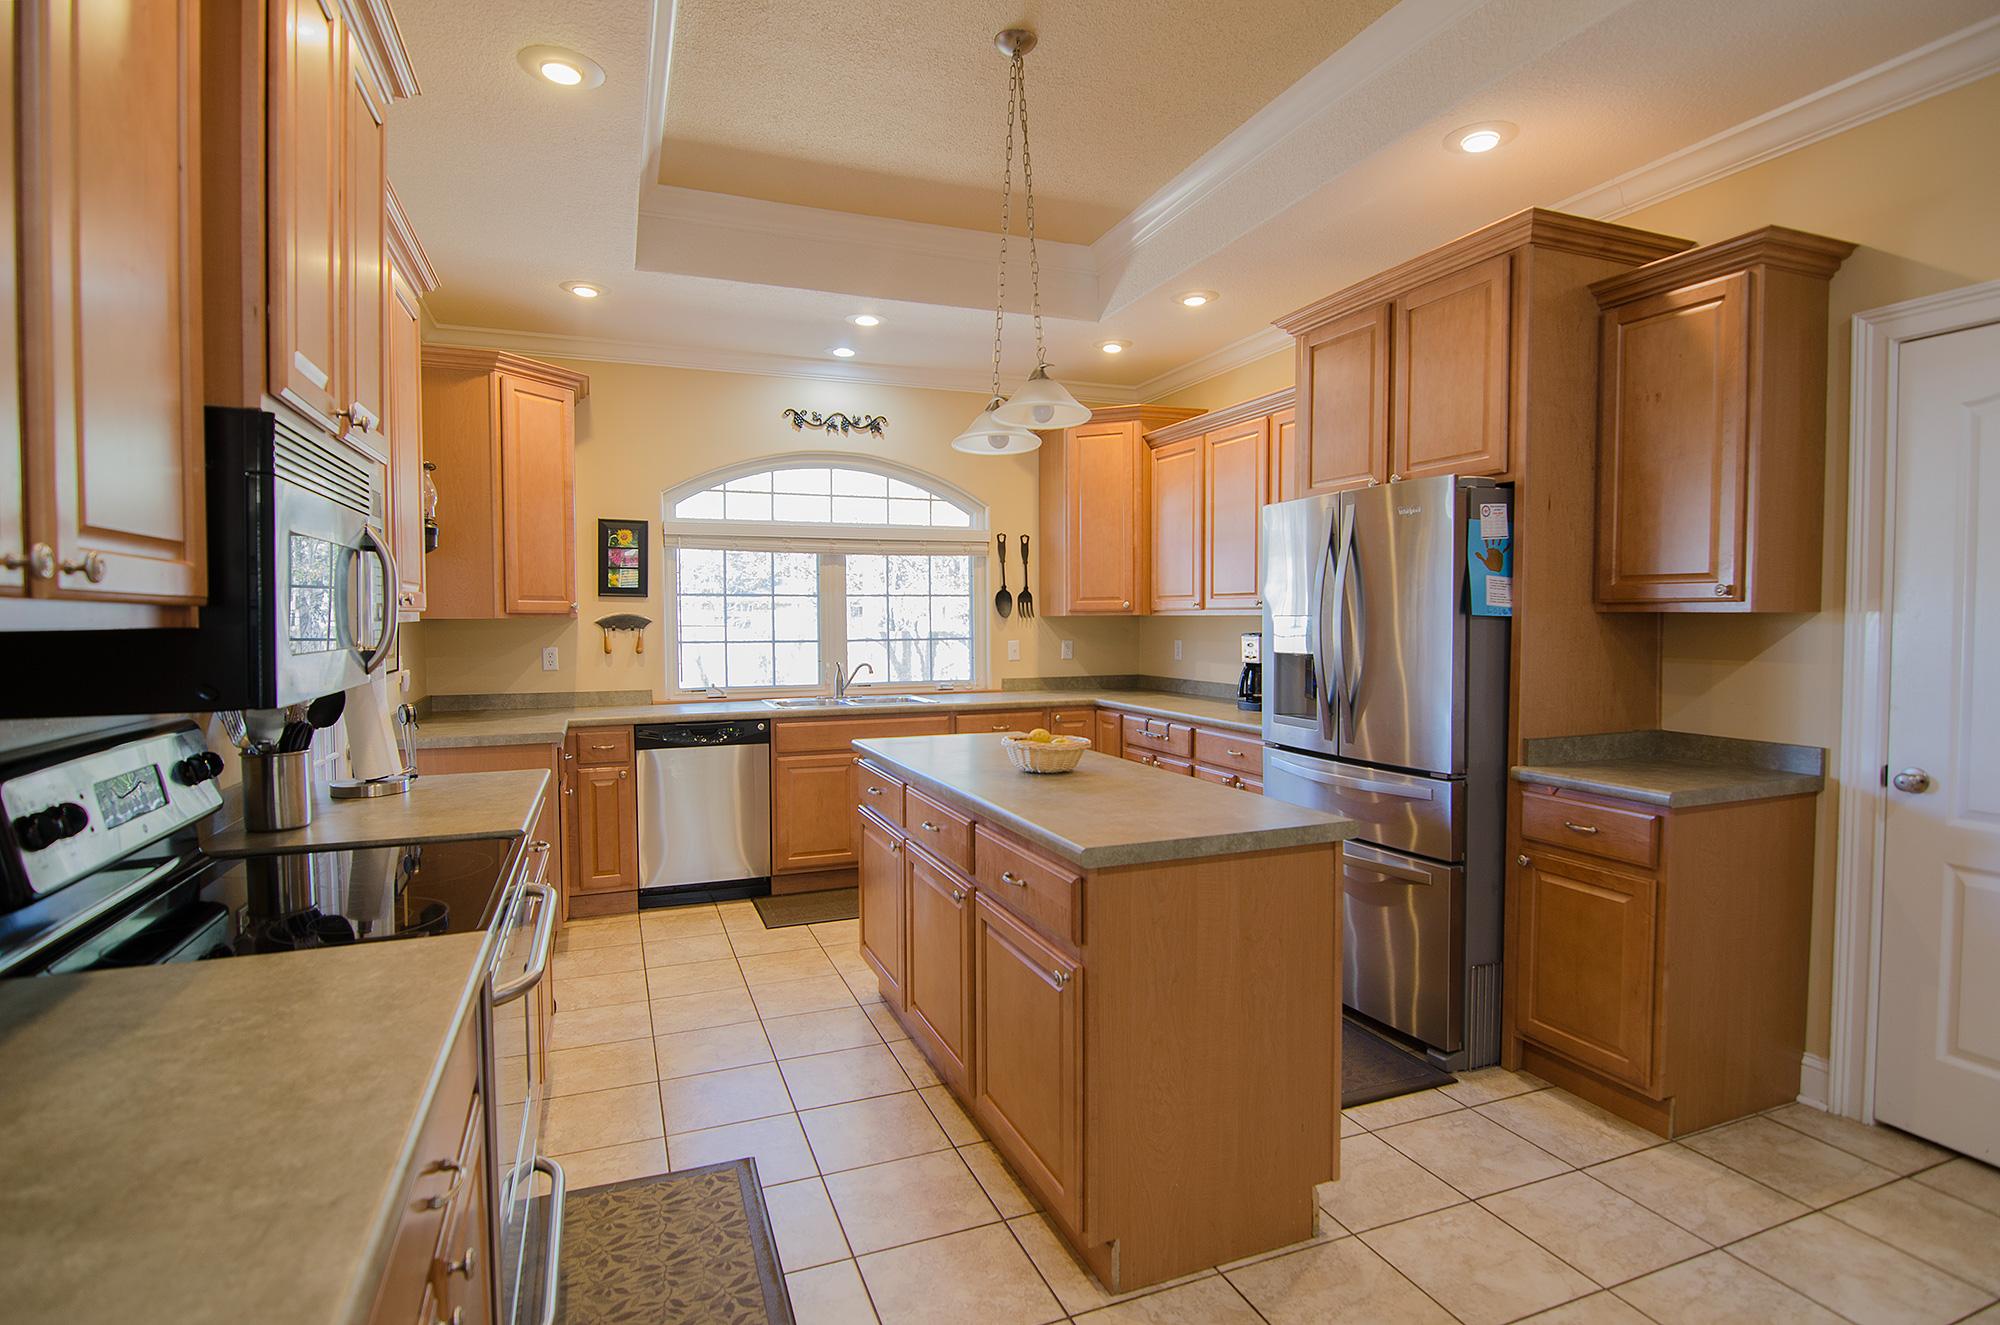 3riversrealty,-bainbridge-home-for-sale,boxwood-drive,mills-brock,randee-eubanks,kitchen.jpg